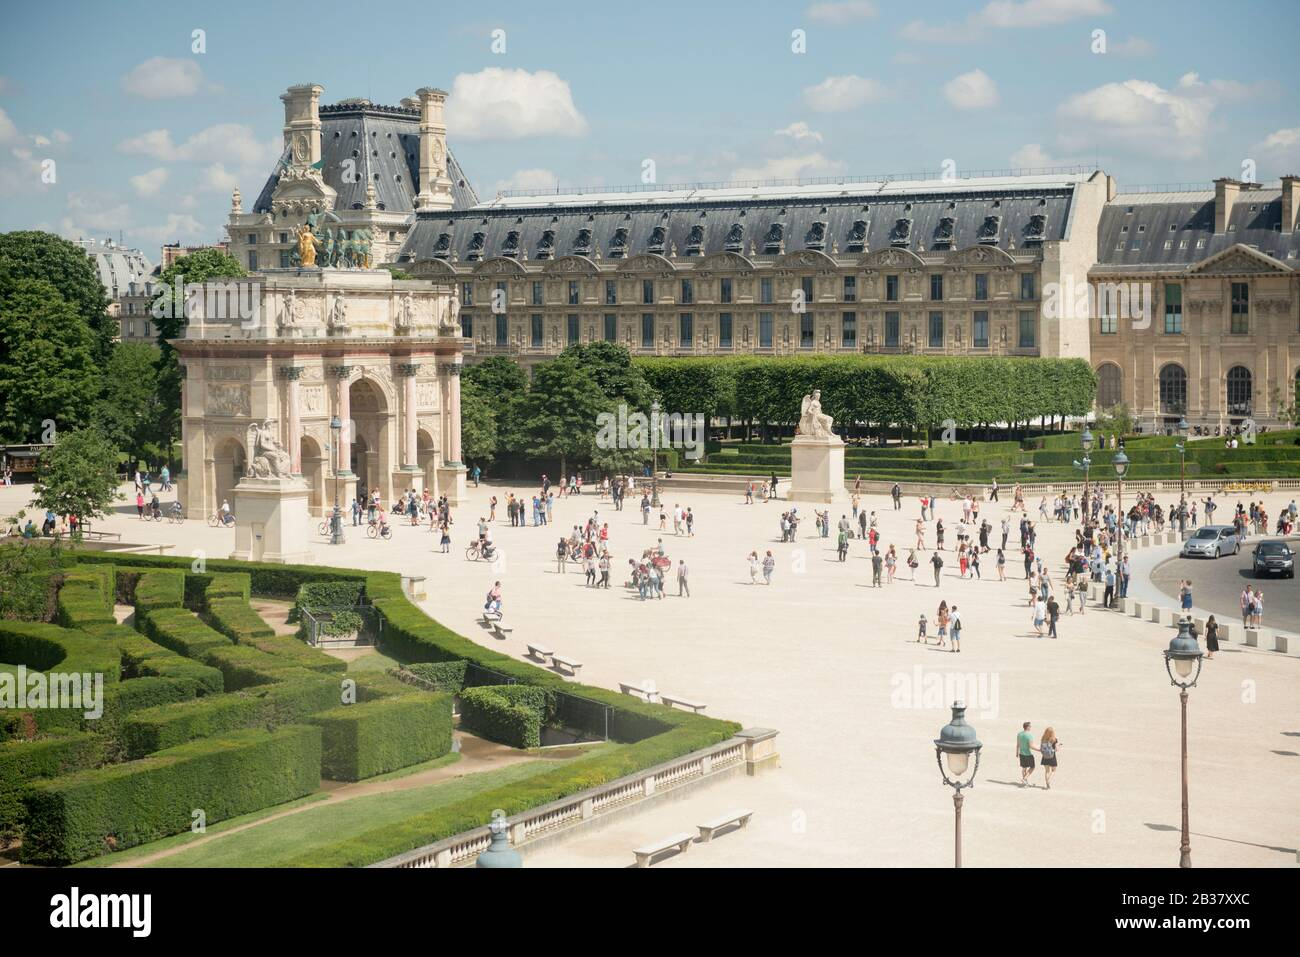 Summer view of the Jardin and Arc de Triomphe du Carrousel next to the Louvre, Paris, France Stock Photo